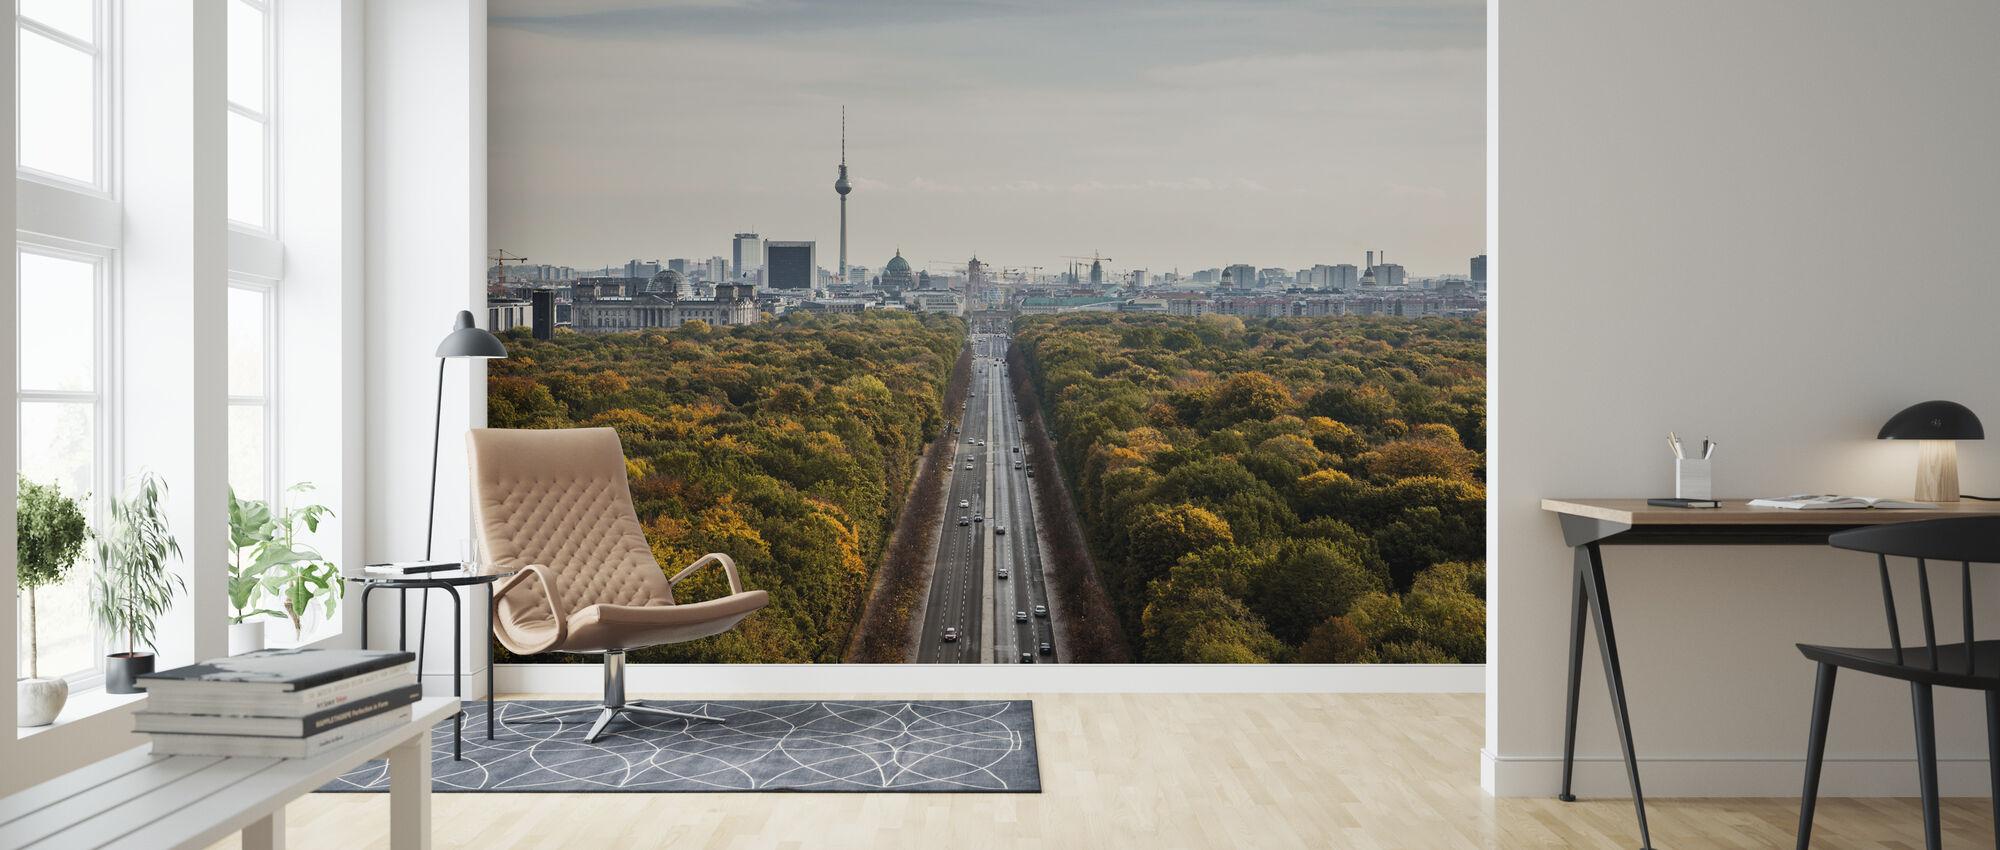 Tiergatan, Berlin - Wallpaper - Living Room